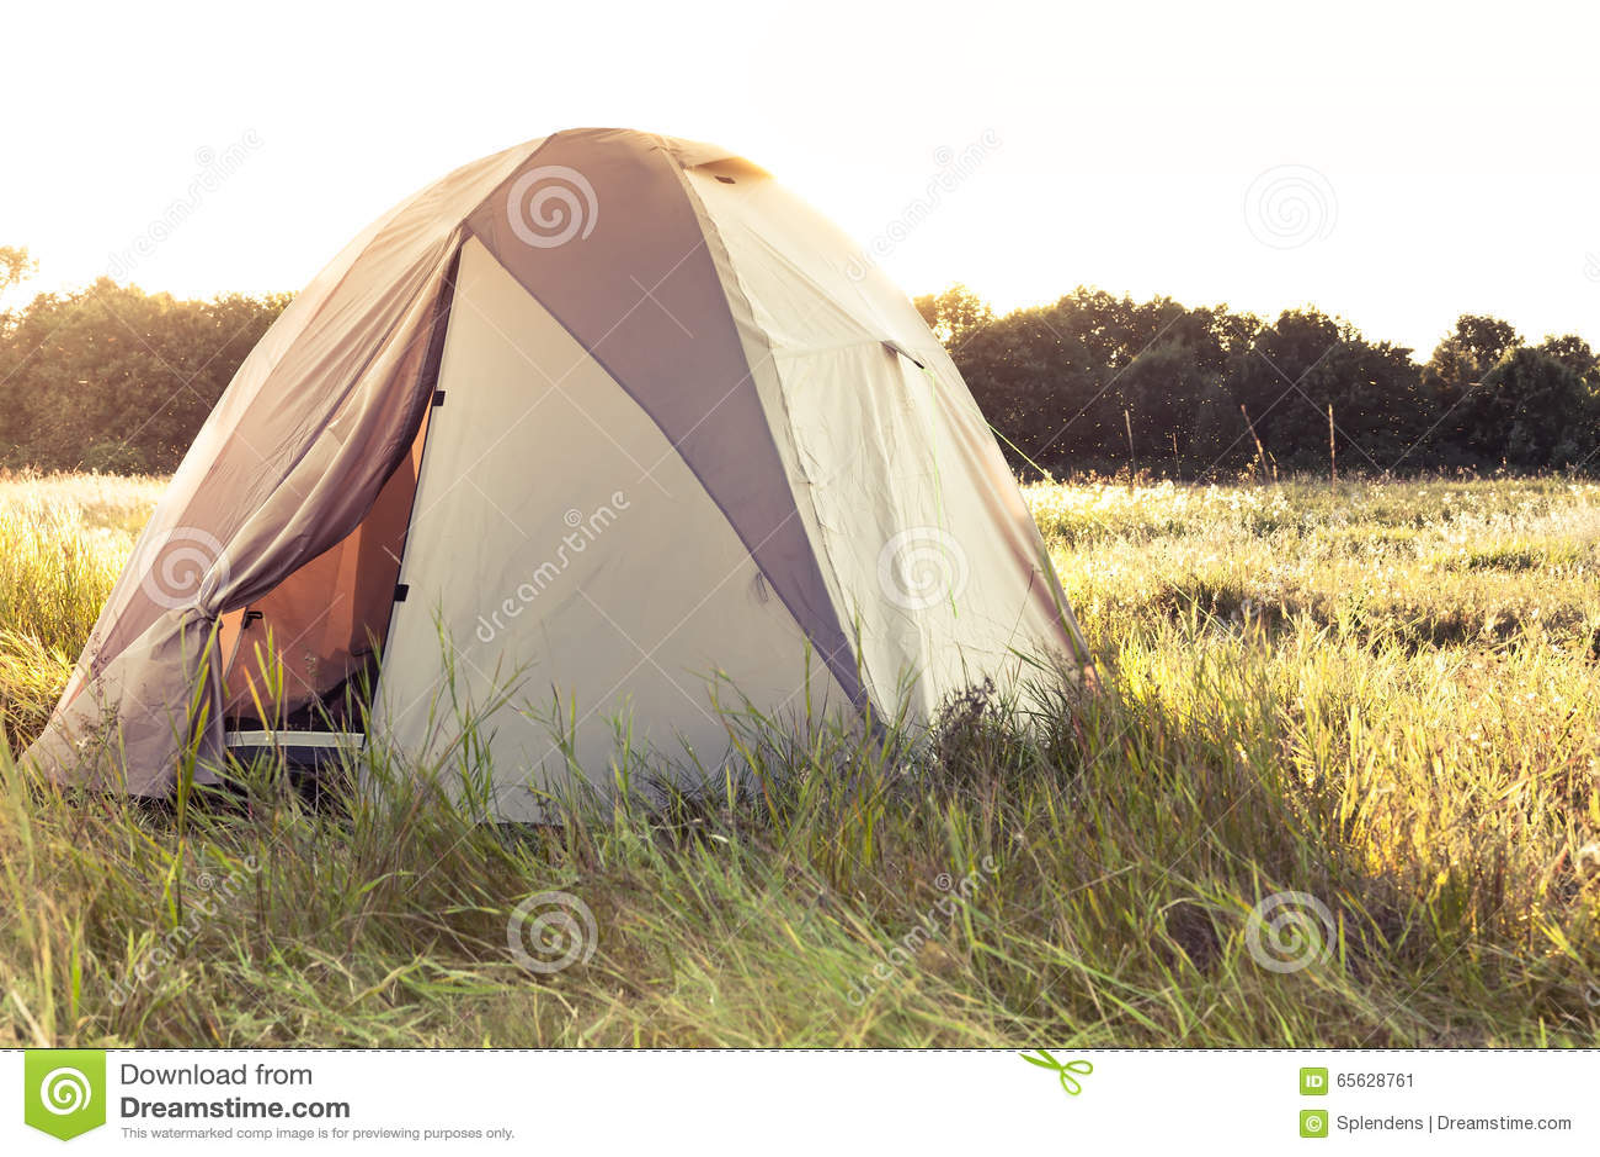 C&ing tent on field  sc 1 st  Megapixl & Camping Tent On Field Stock Photo 65628761 - Megapixl